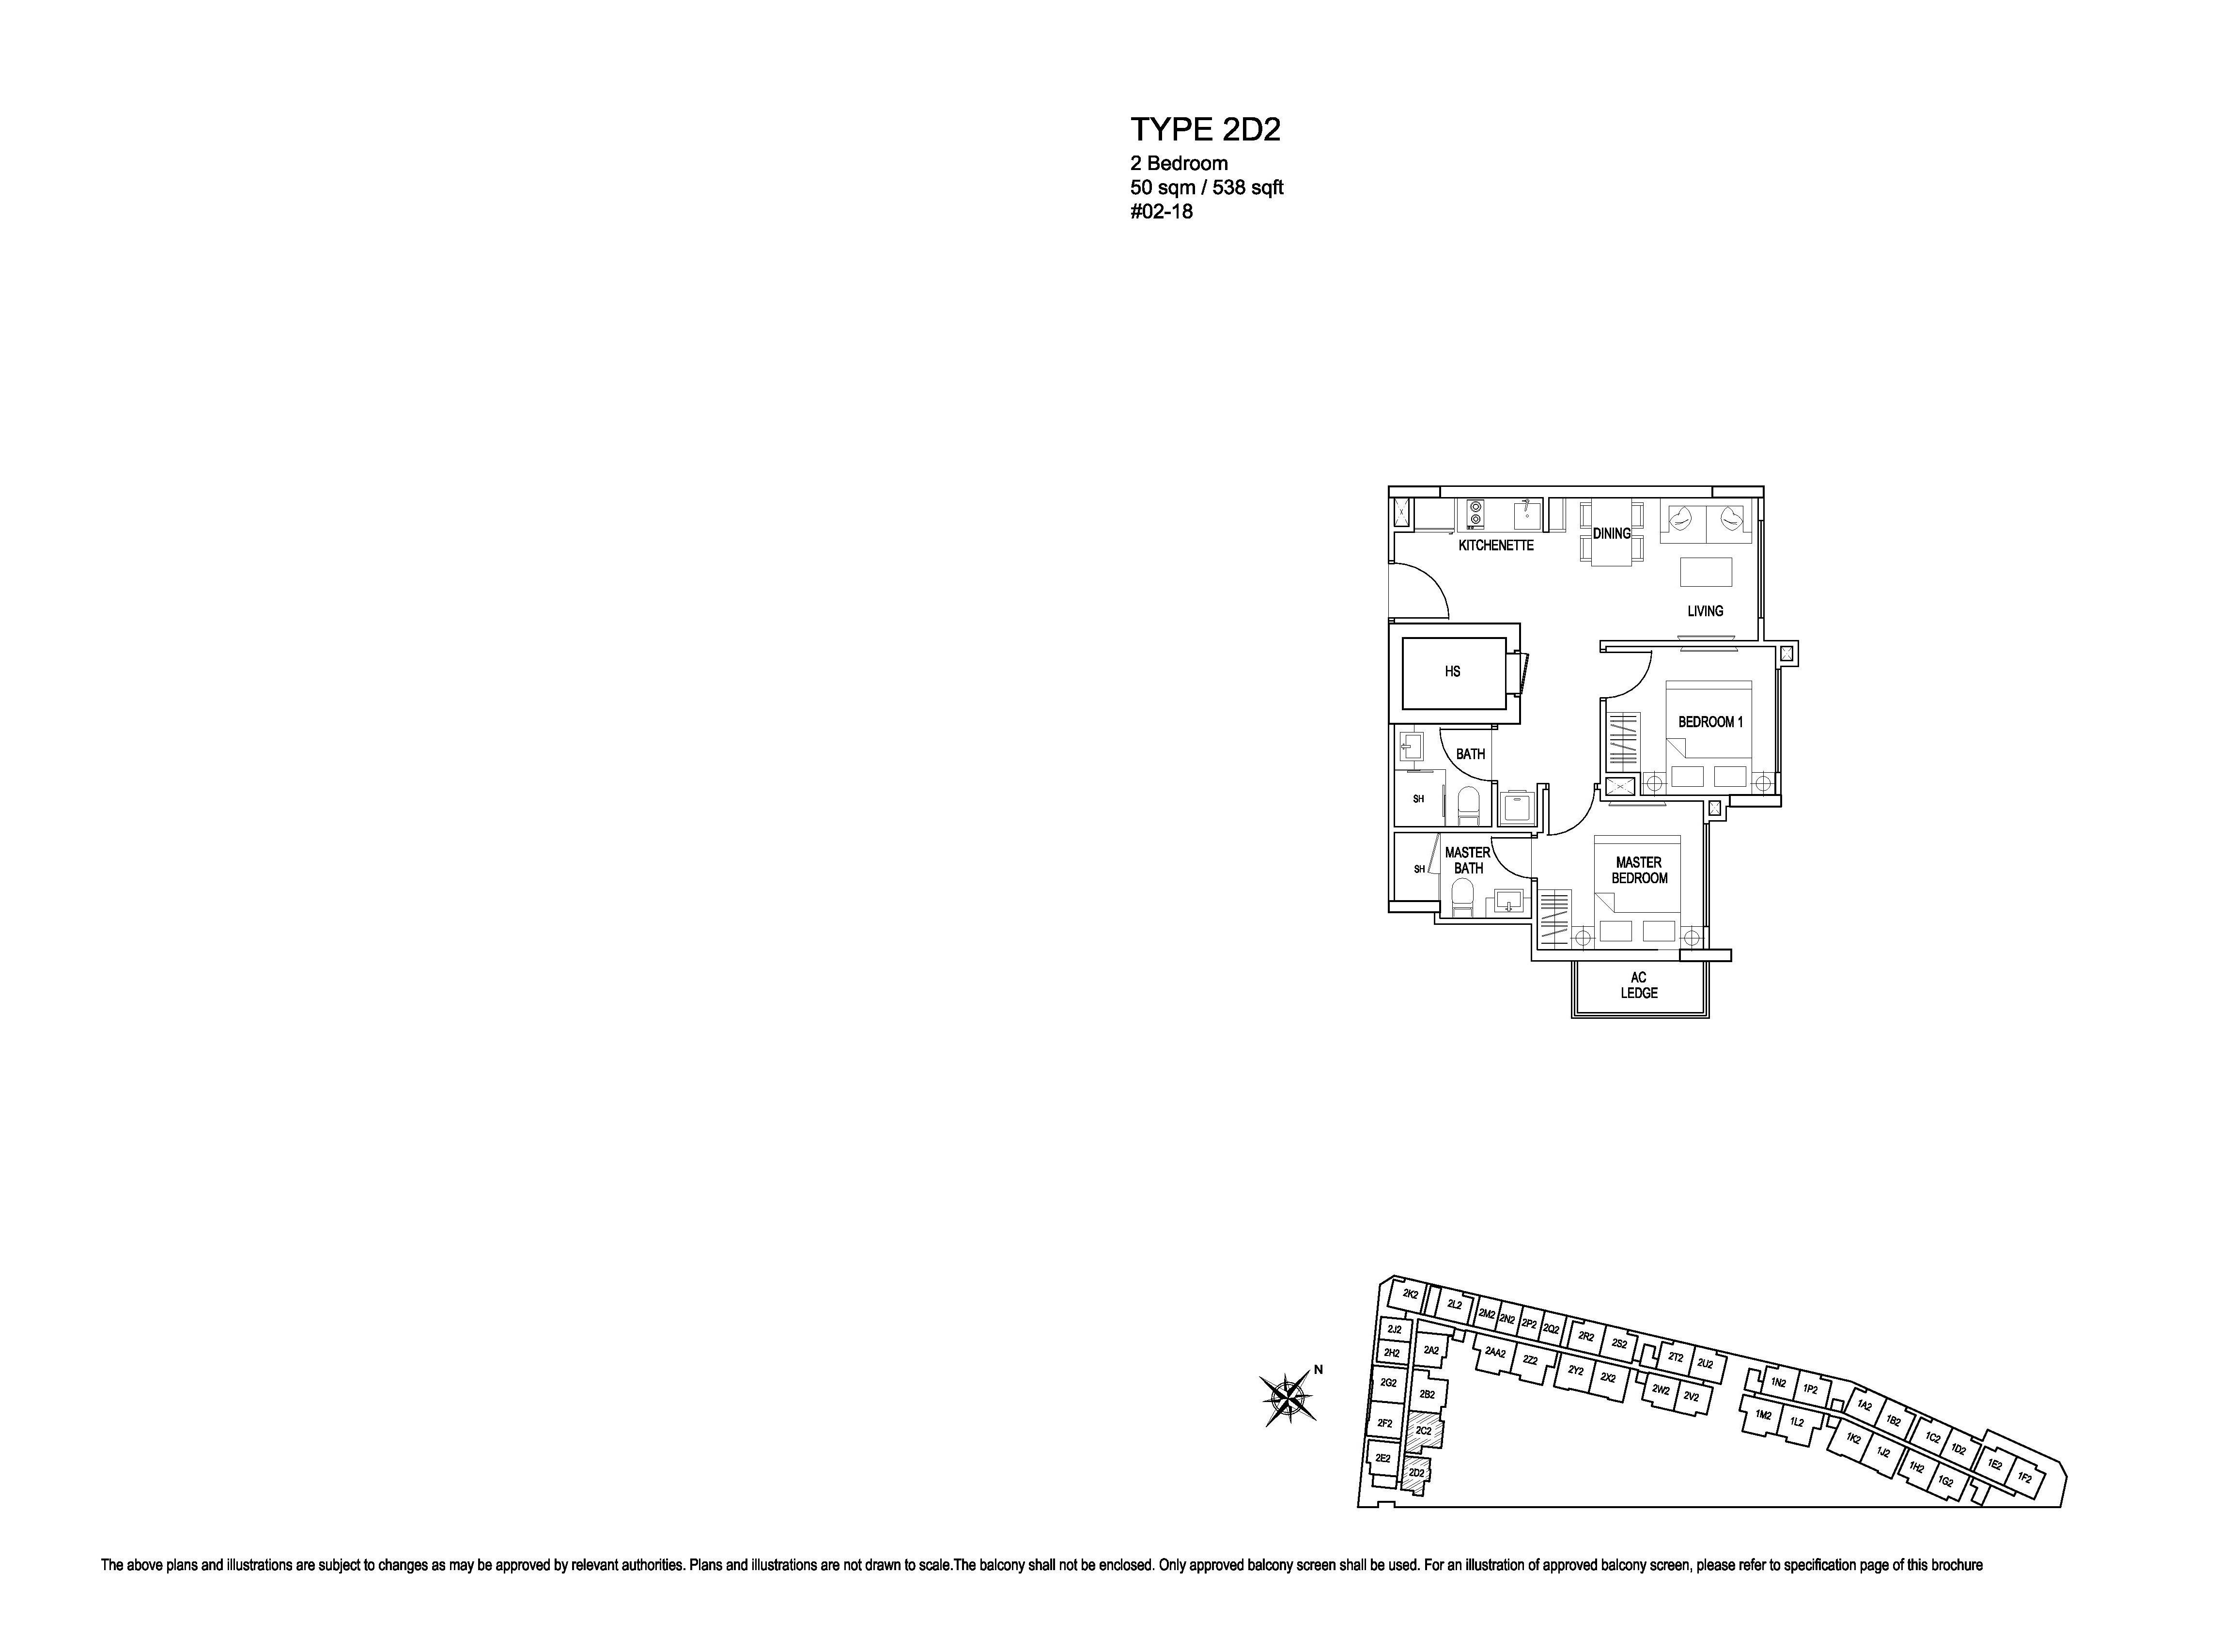 Kensington Square 2 Bedroom Floor Plans Type 2D2